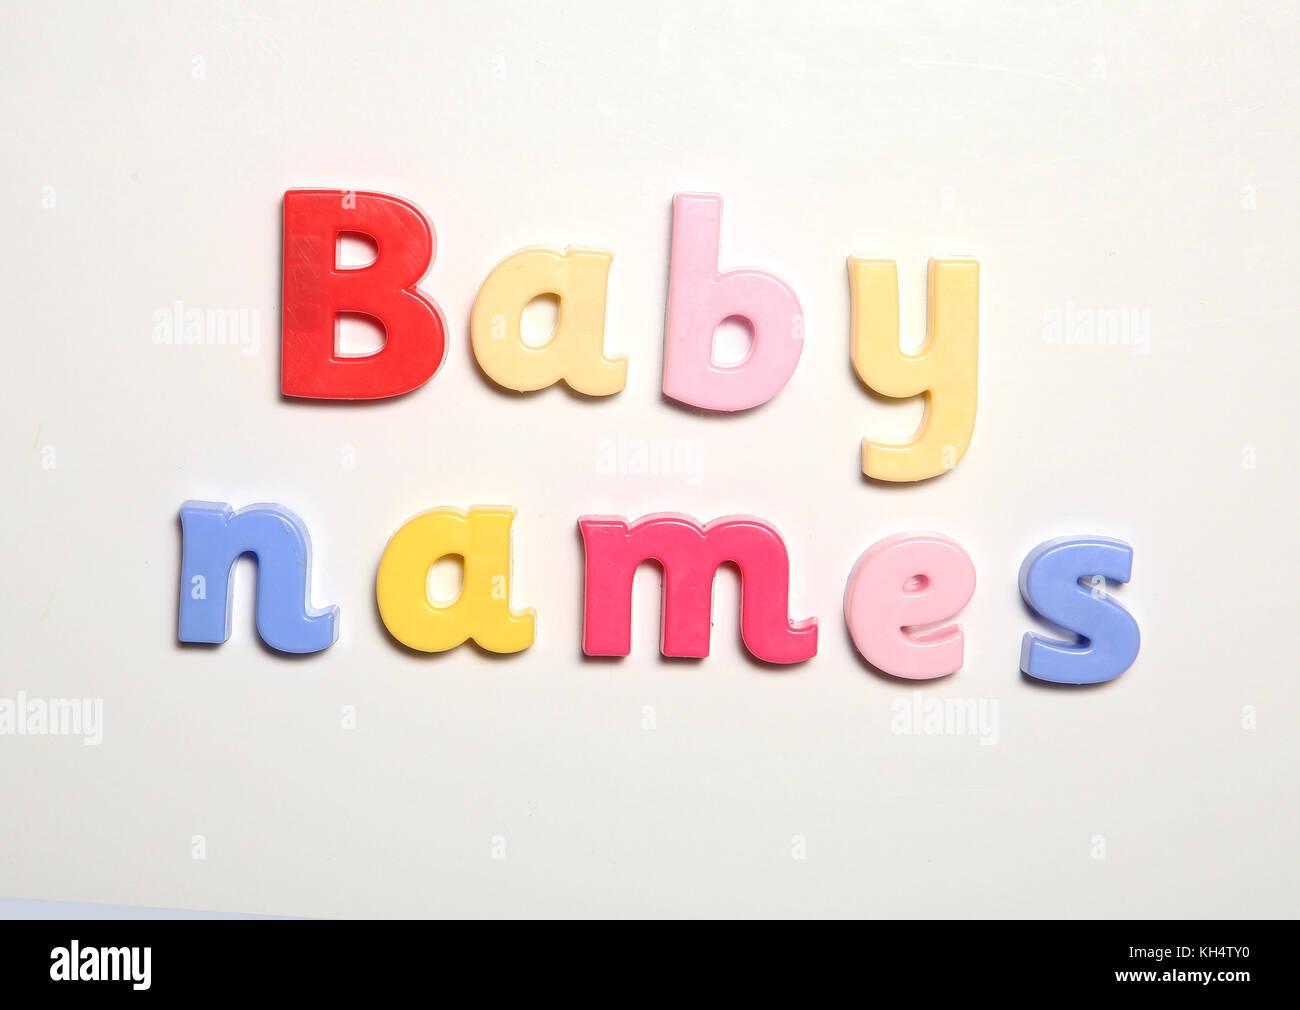 baby names spelt in magnet letters - Stock Image